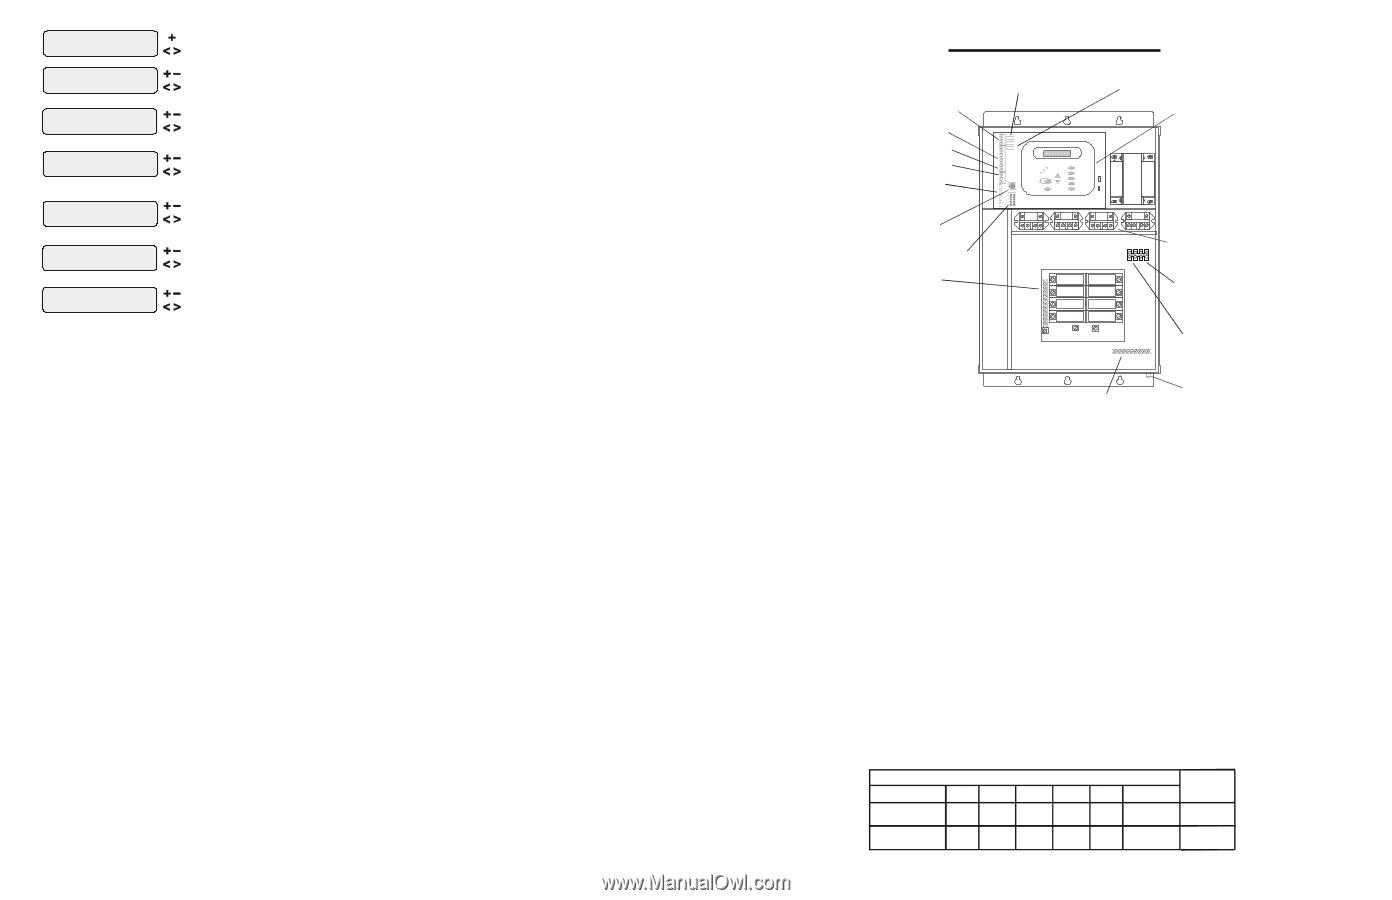 Hayward Super Ii Pool Pump Wiring Diagram Also Transformer Wiring